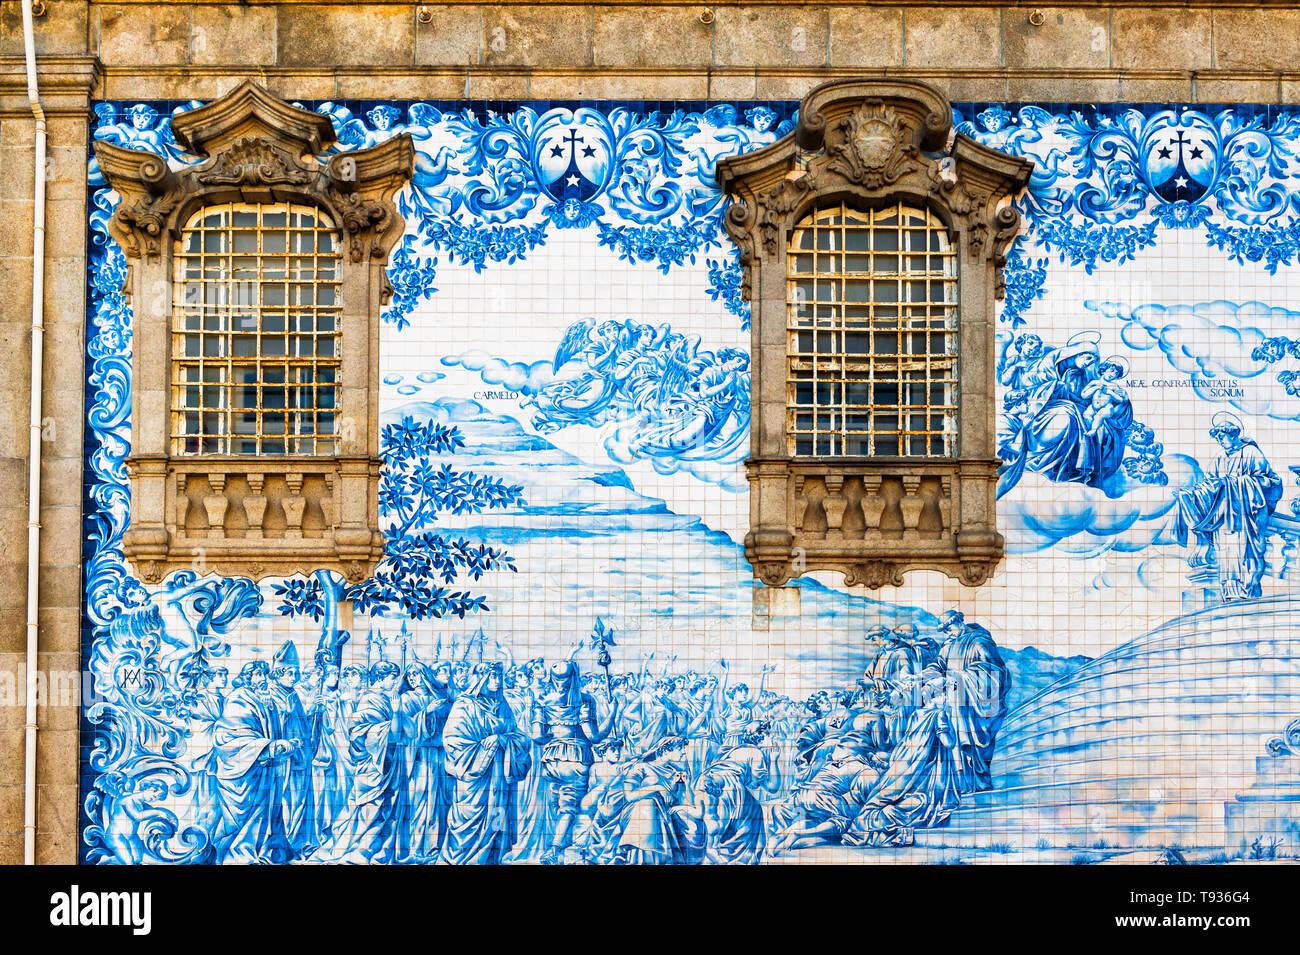 Azulejos on the walls of Capela Das Almas, Unesco World Heritage Site, OPorto, Portugal - Stock Image